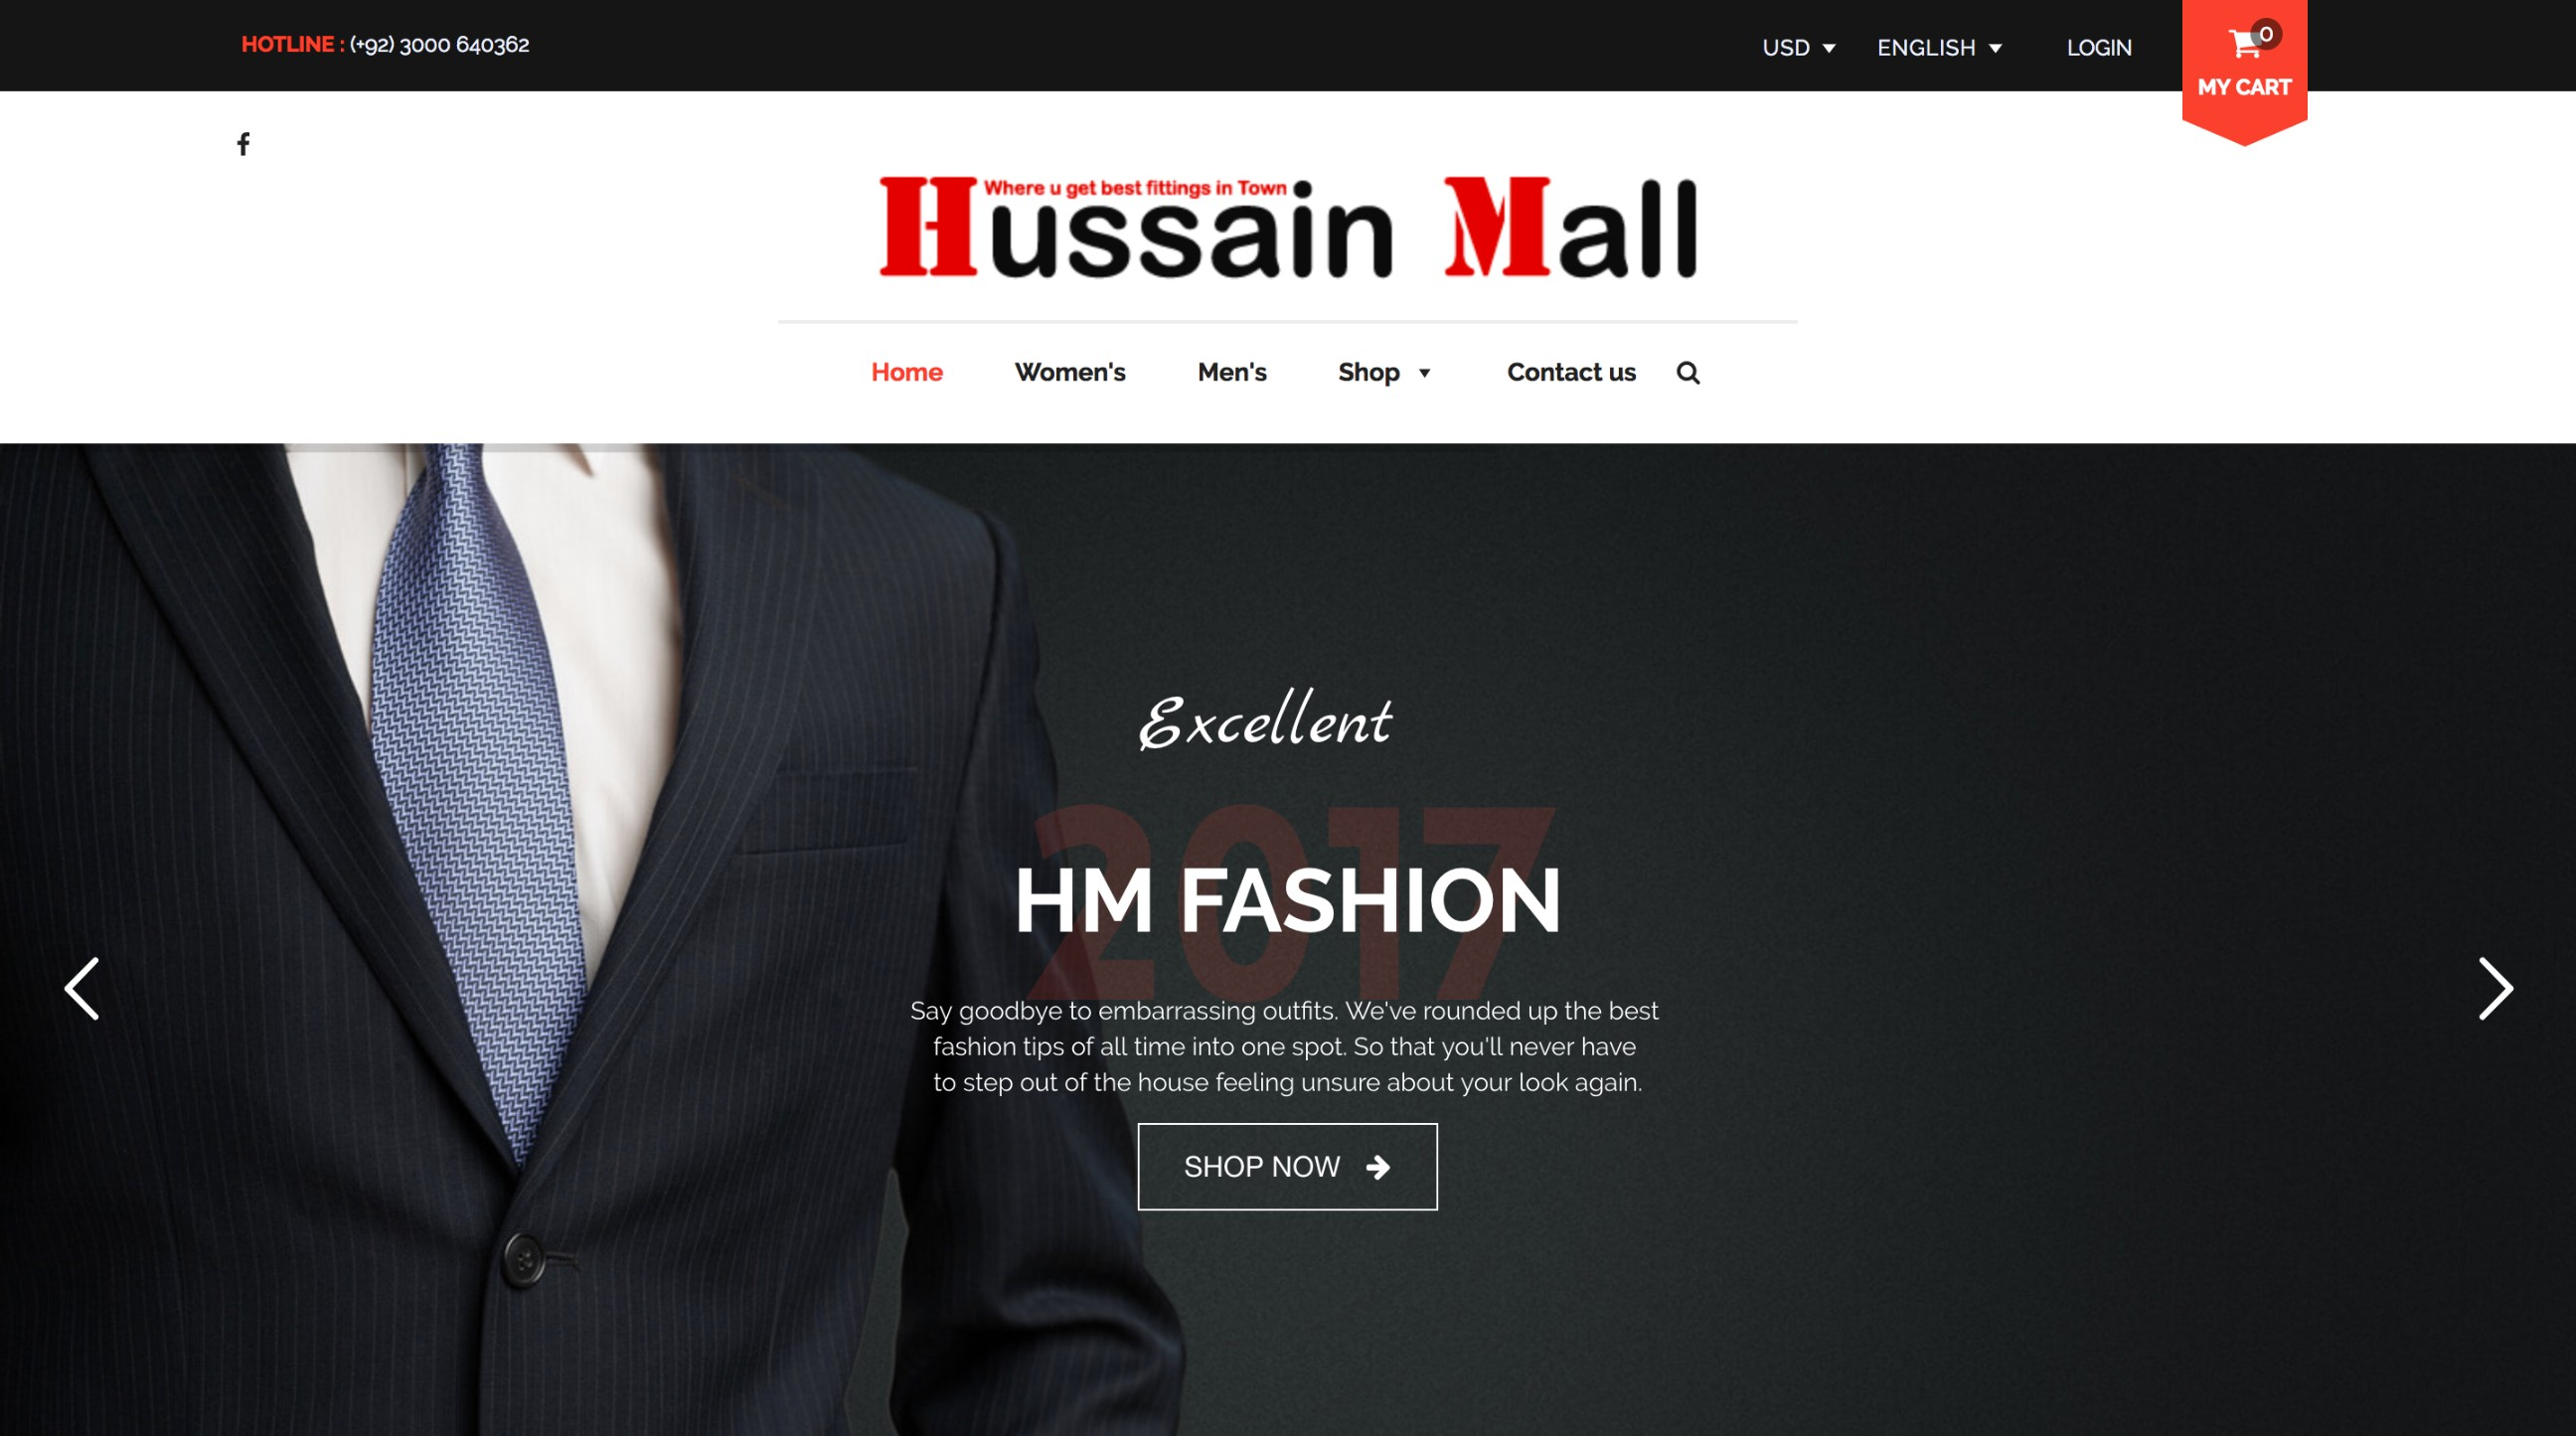 Hussain Mall